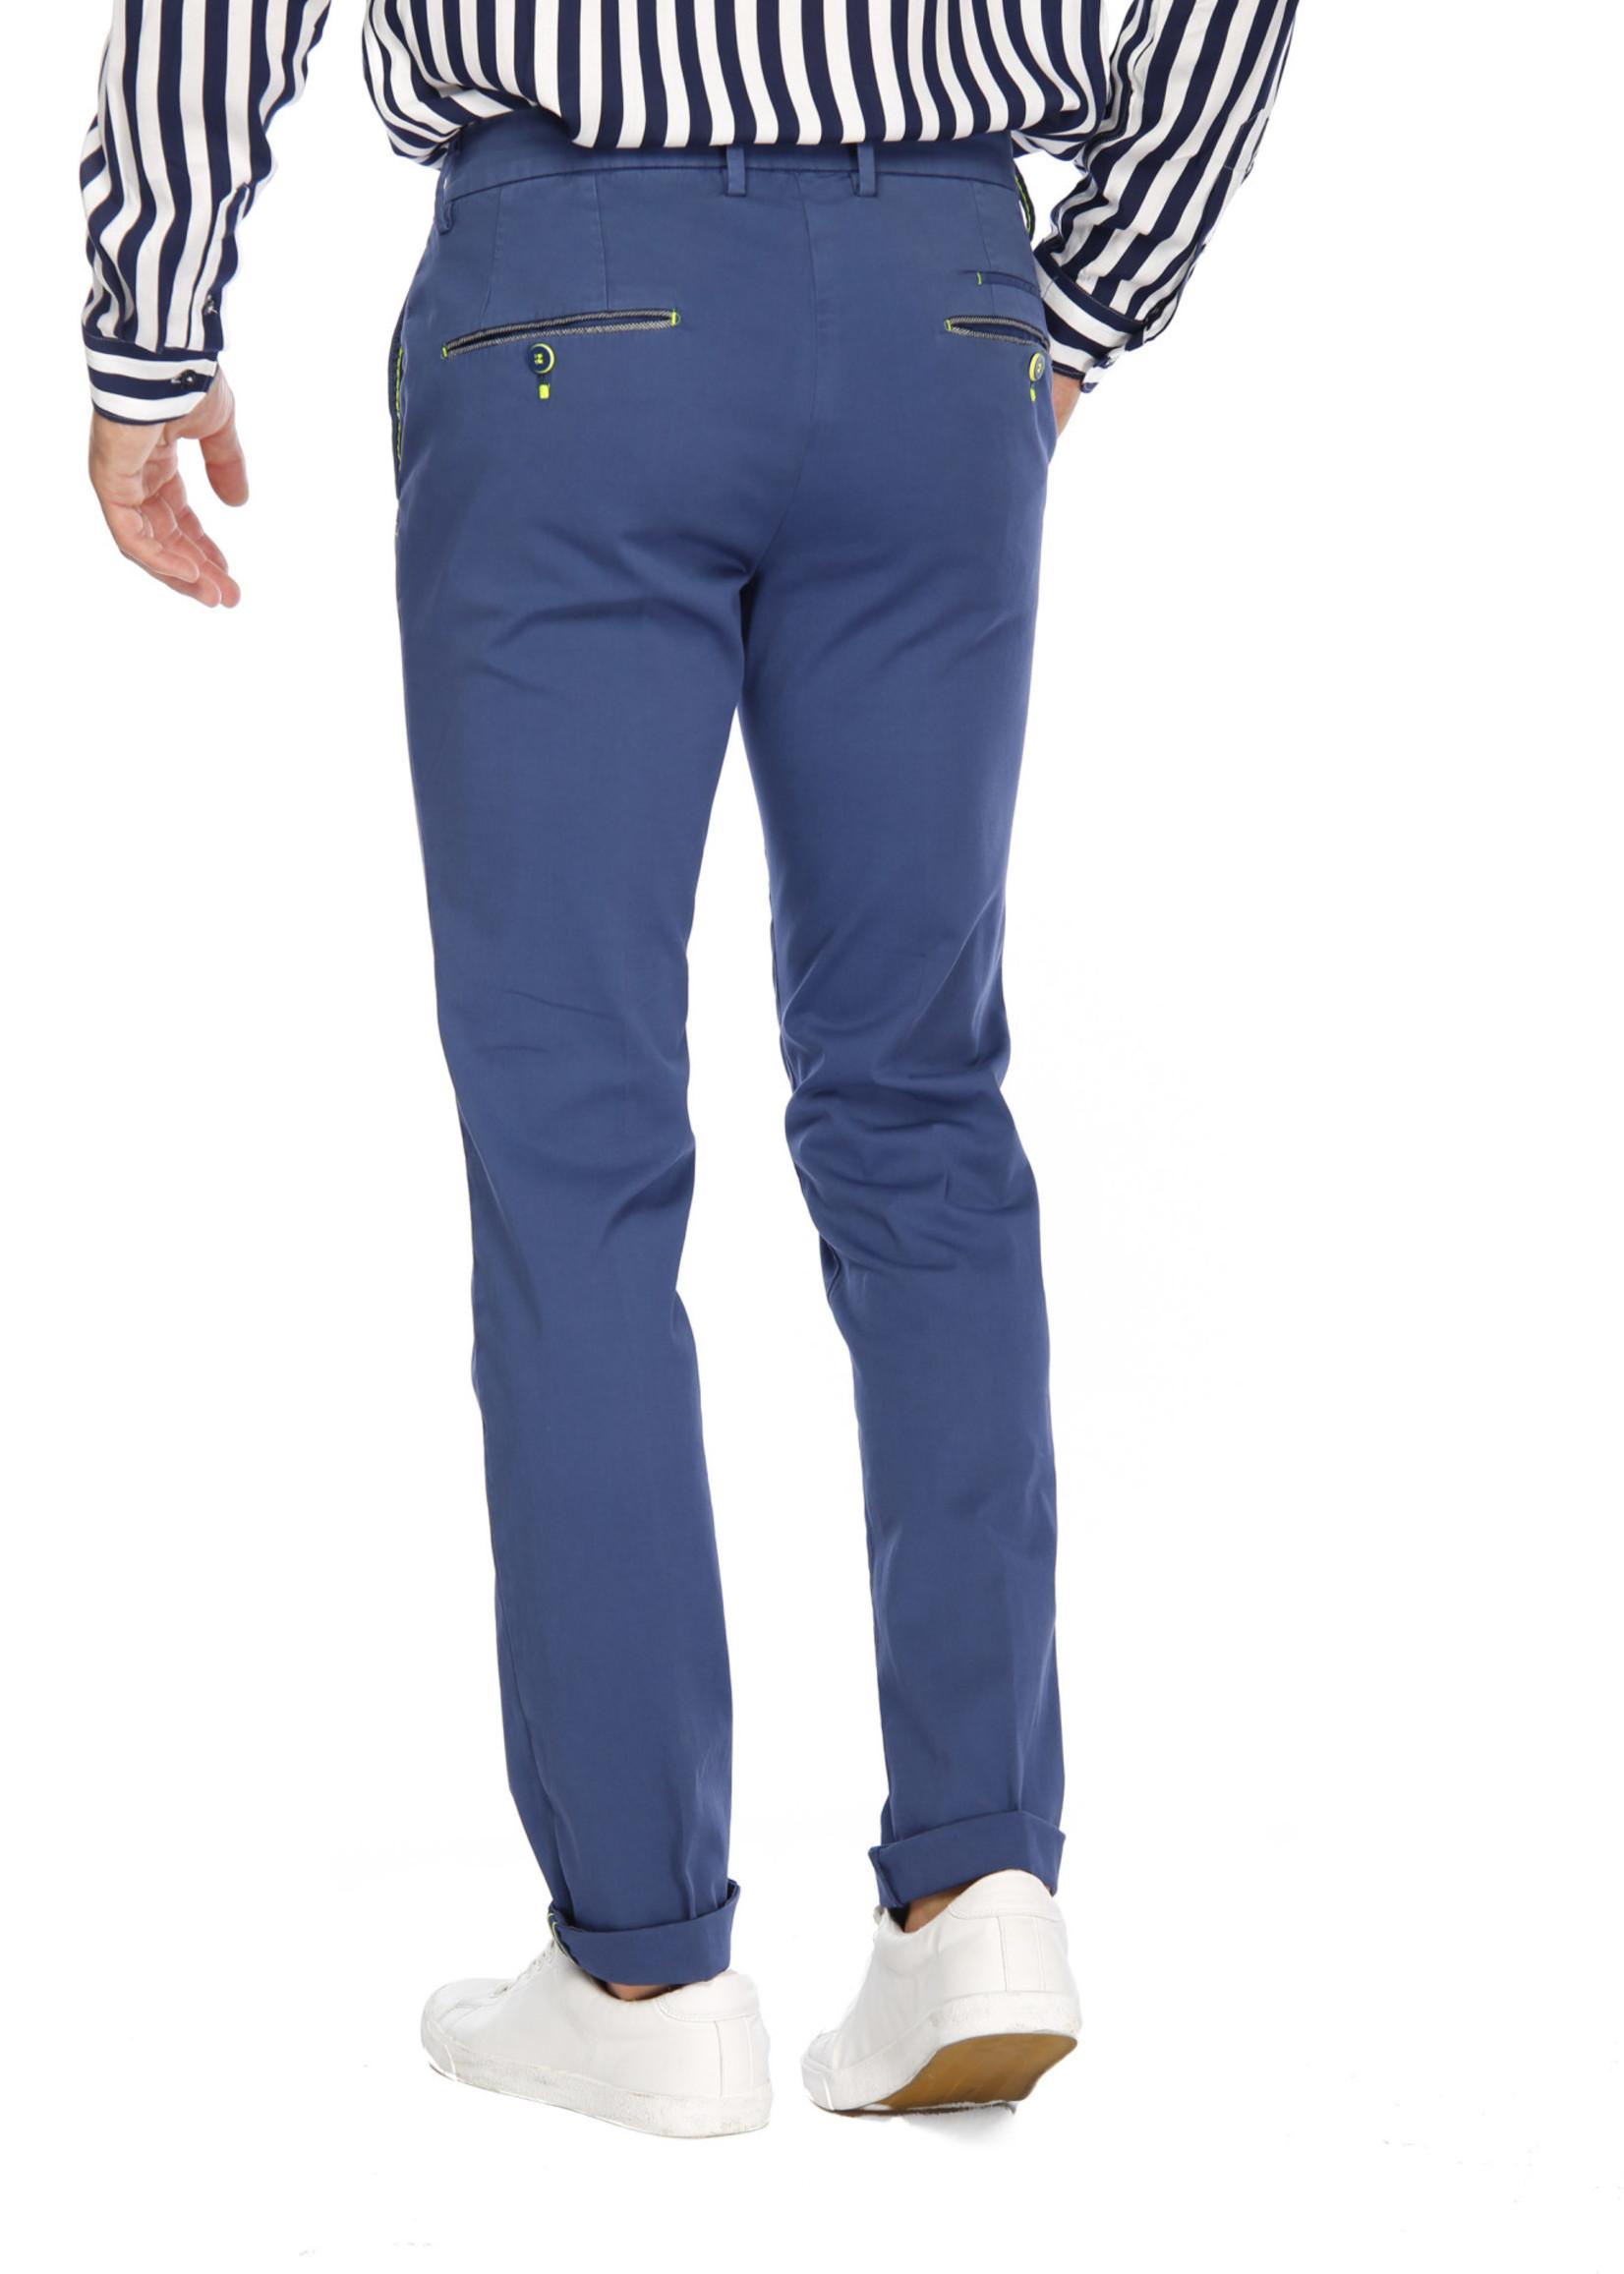 Mason's Broek in stretch satijn en fluo details slim fit Torino Ocean | Blauw indigo | Mason's